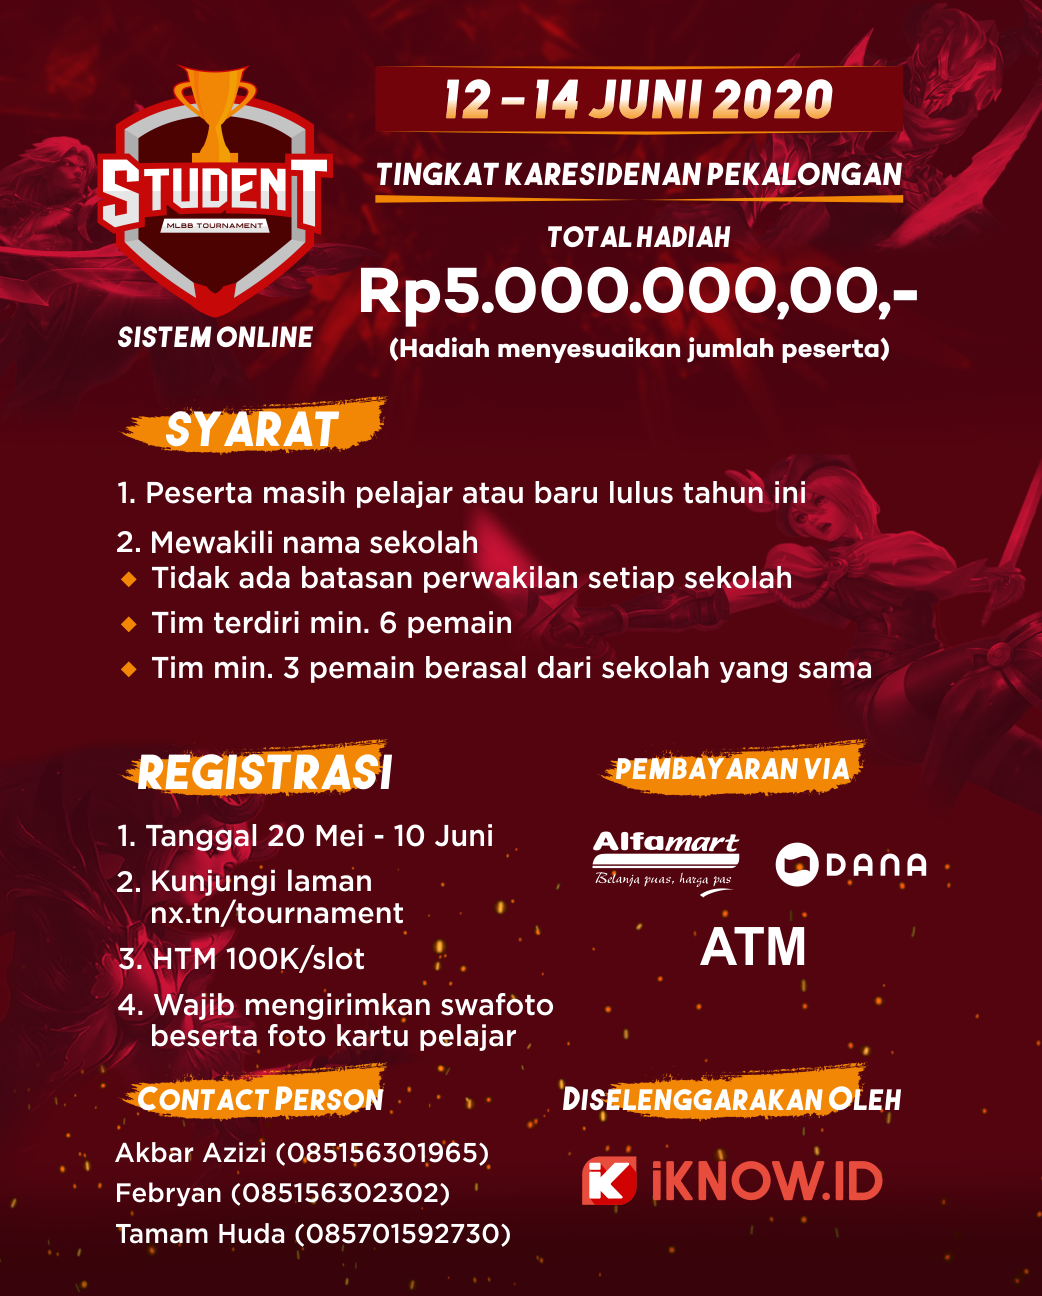 Mobile Legends Student Tournament (Karesidenan Pekalongan)